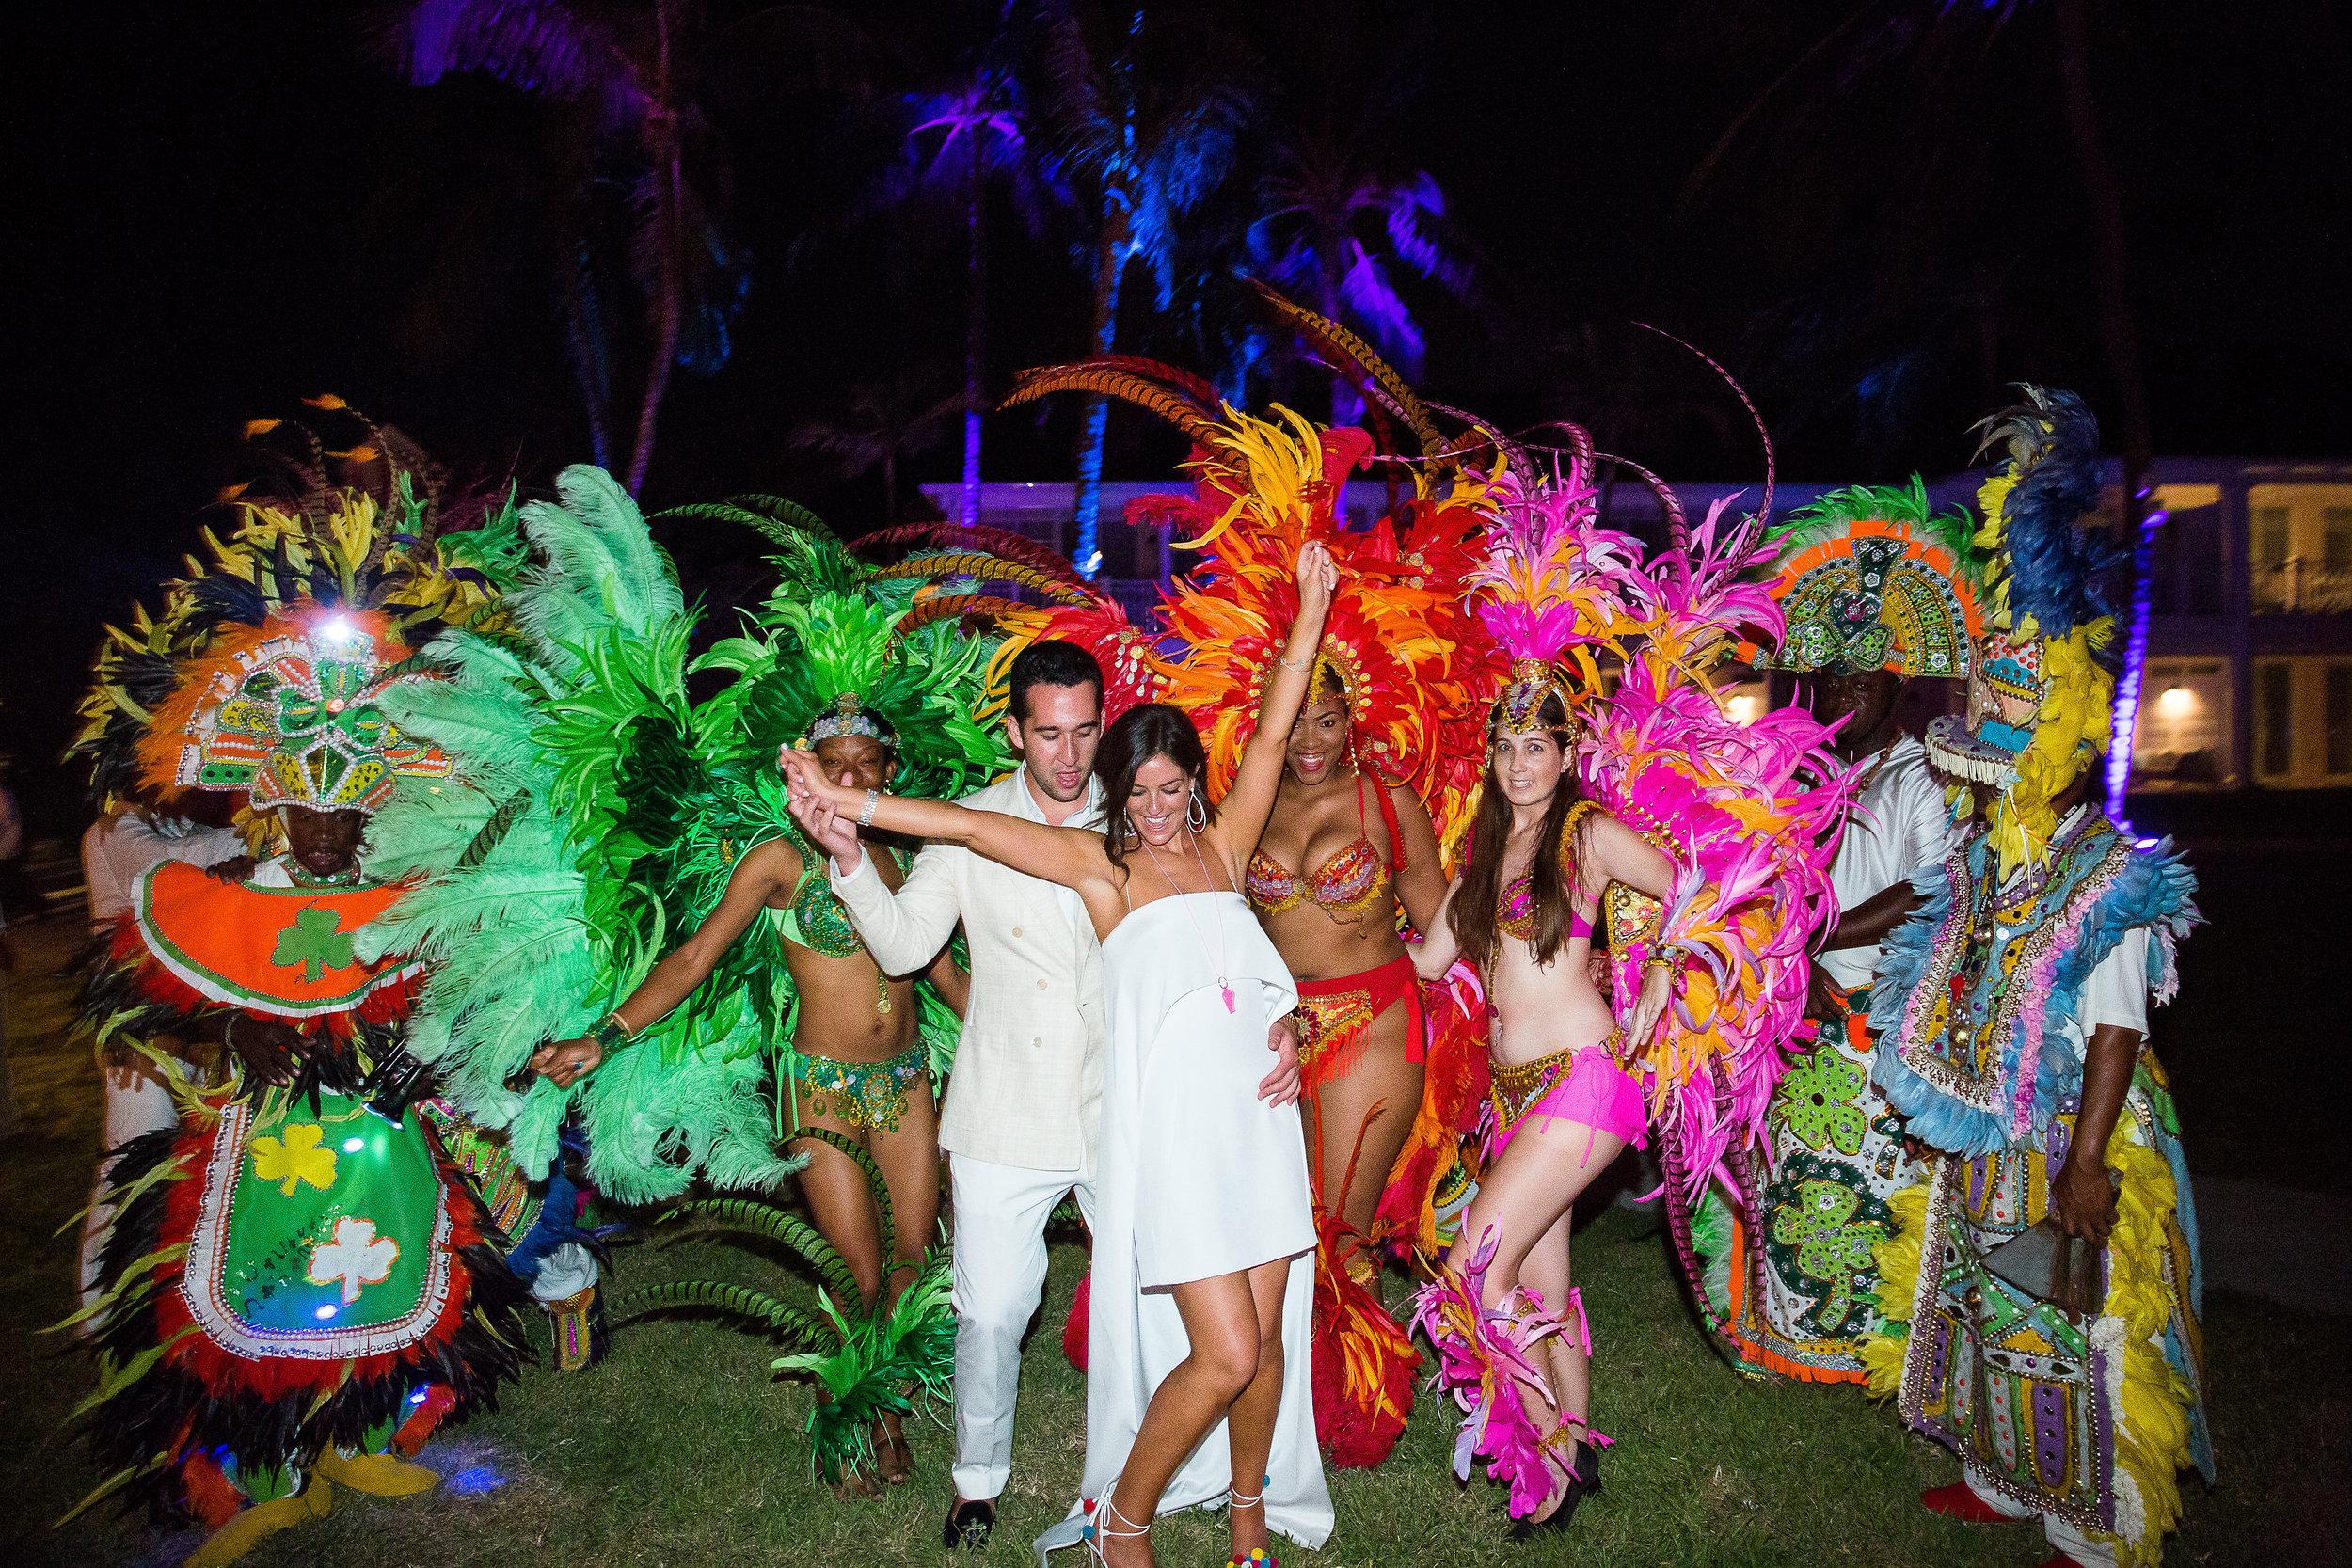 Ceci_New_York_Ceci_Style_Ceci_Johnson_Luxury_Lifestyle_Destination_Bahamas_Wedding_Letterpress_Inspiration_Design_Custom_Couture_Personalized_Invitations_50.jpg